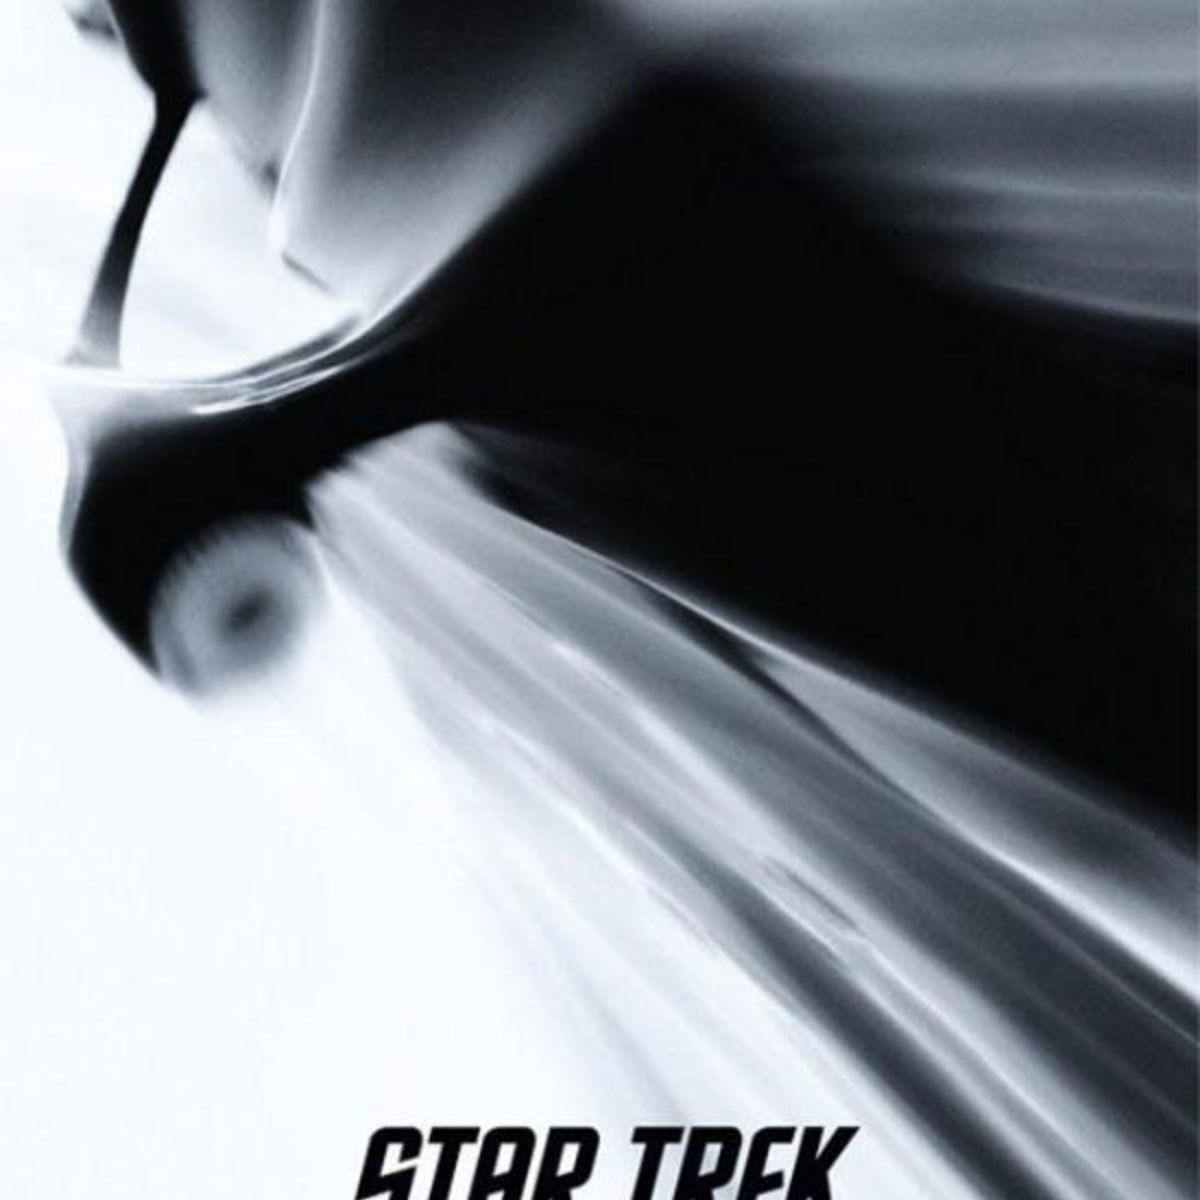 StarTrek_newposter.jpg